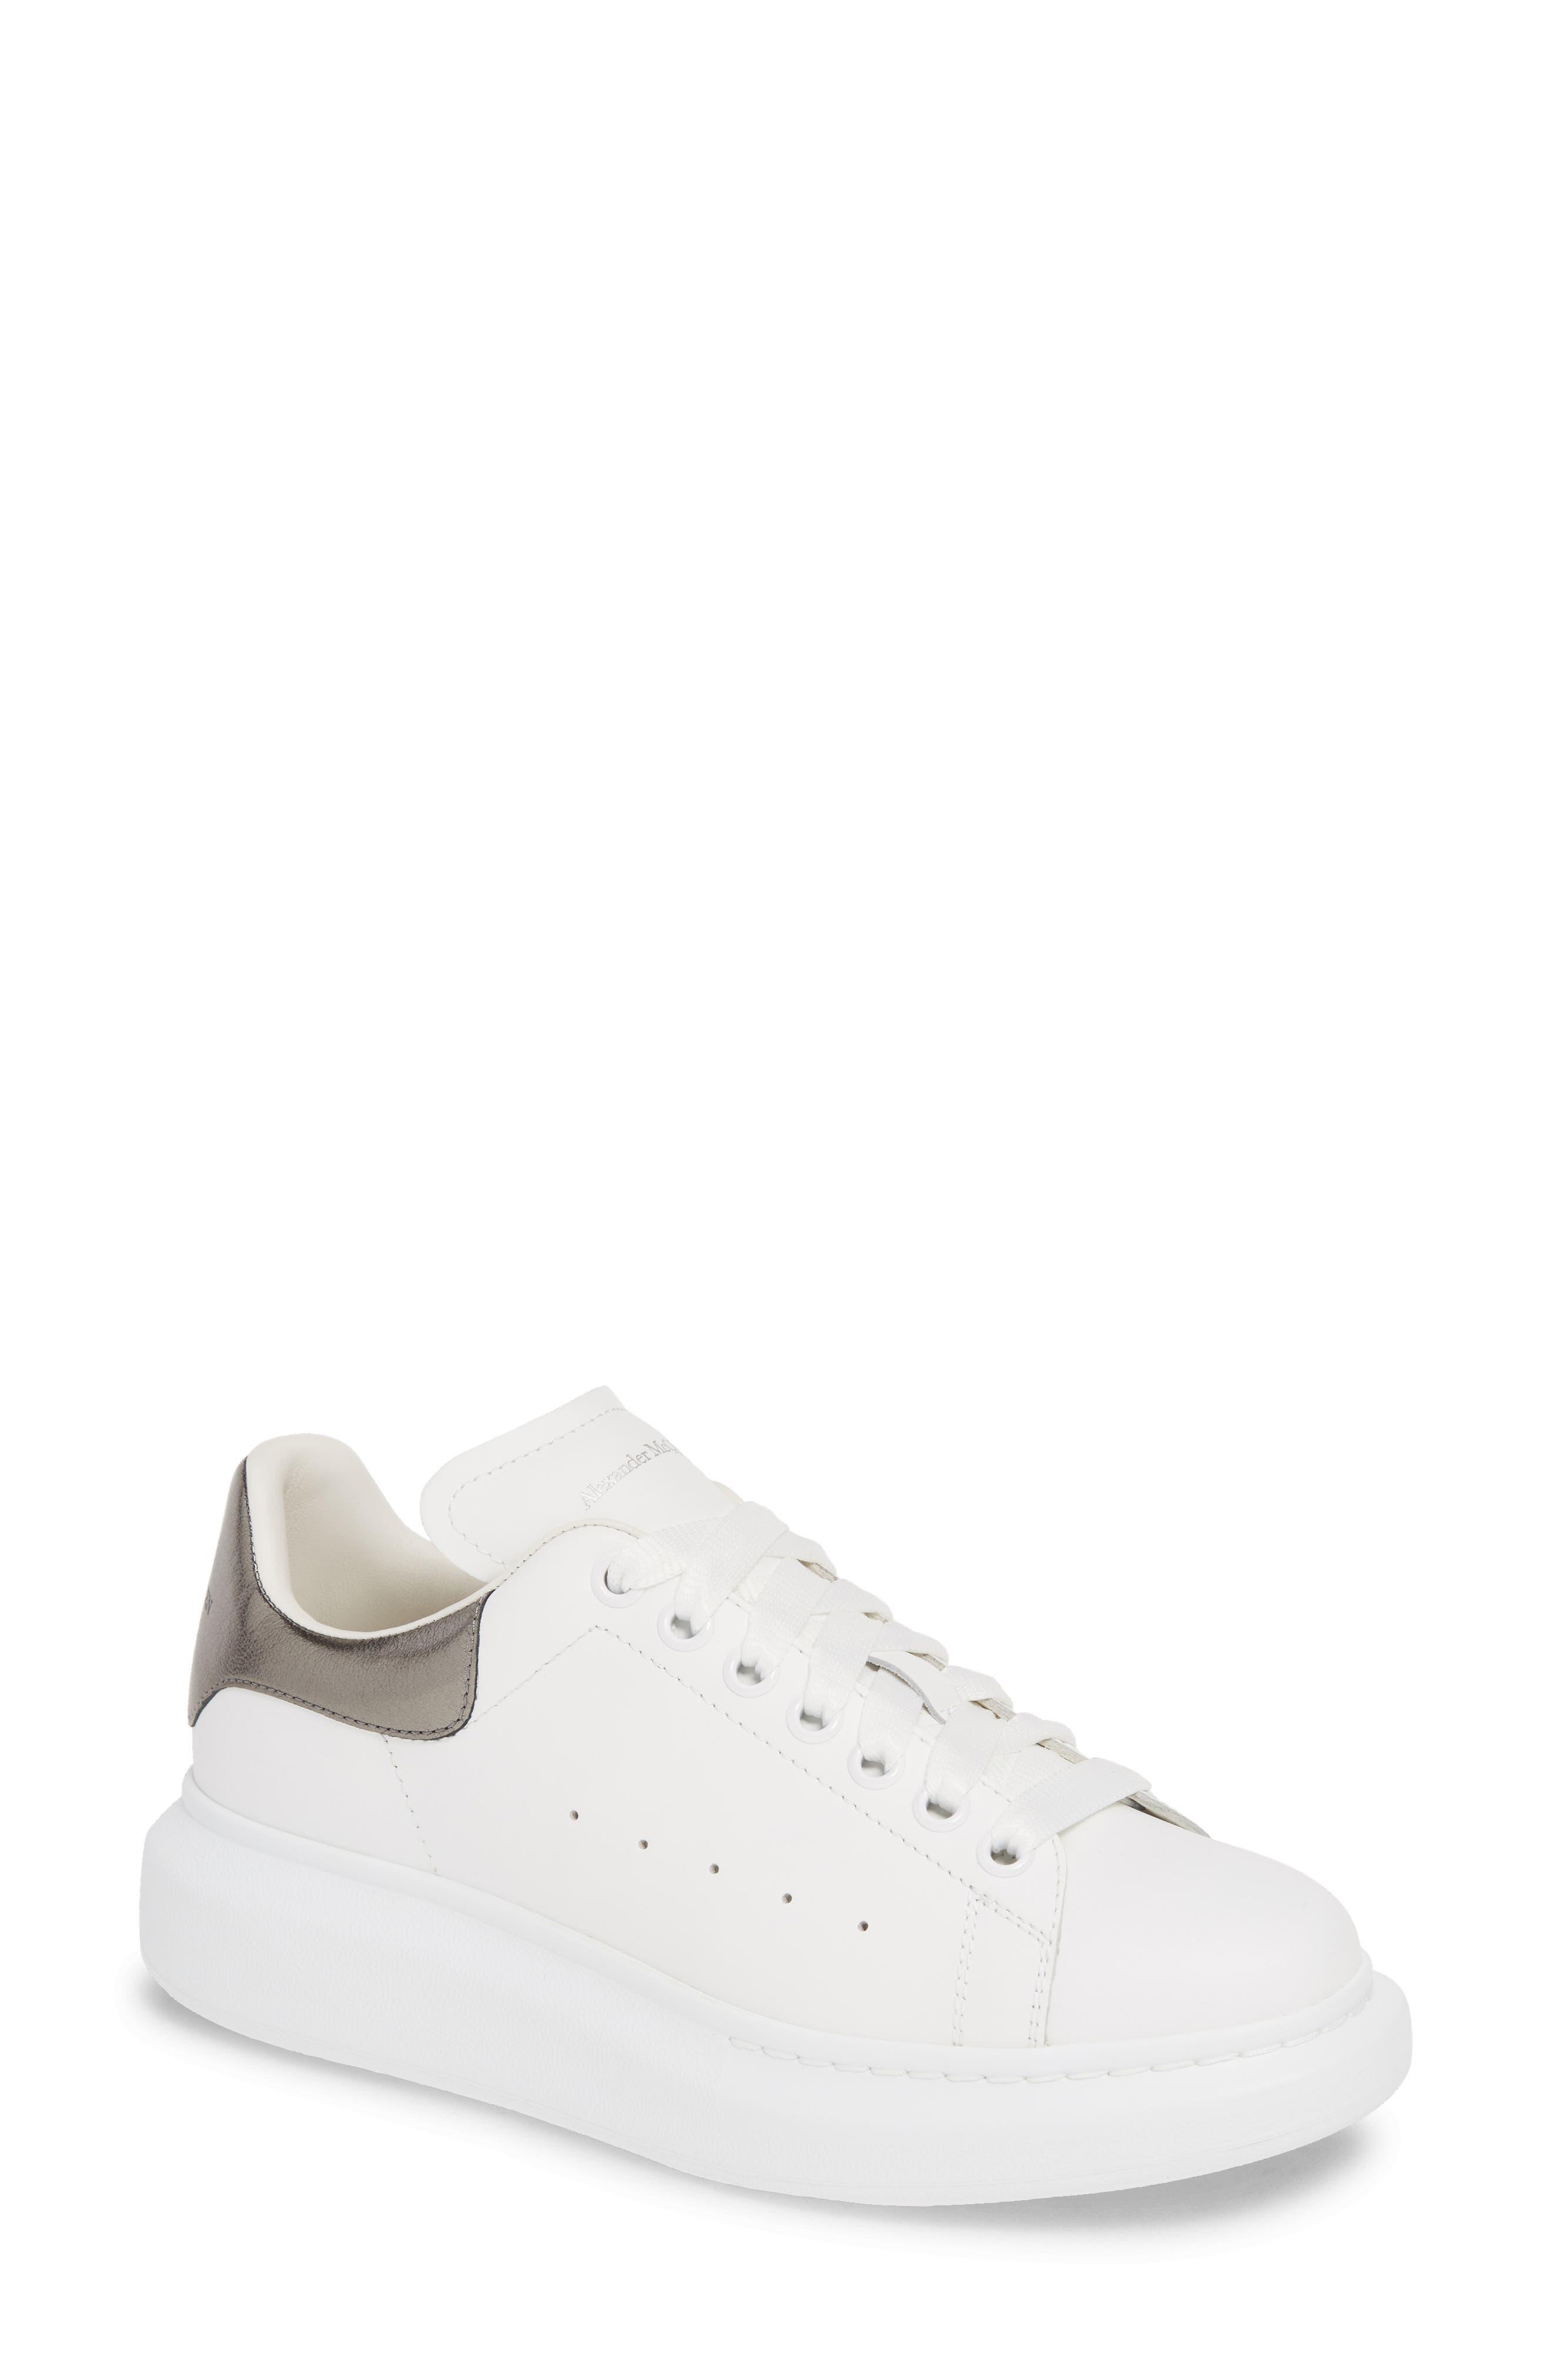 Sneaker, Main, color, WHITE/ BLACK PEARL